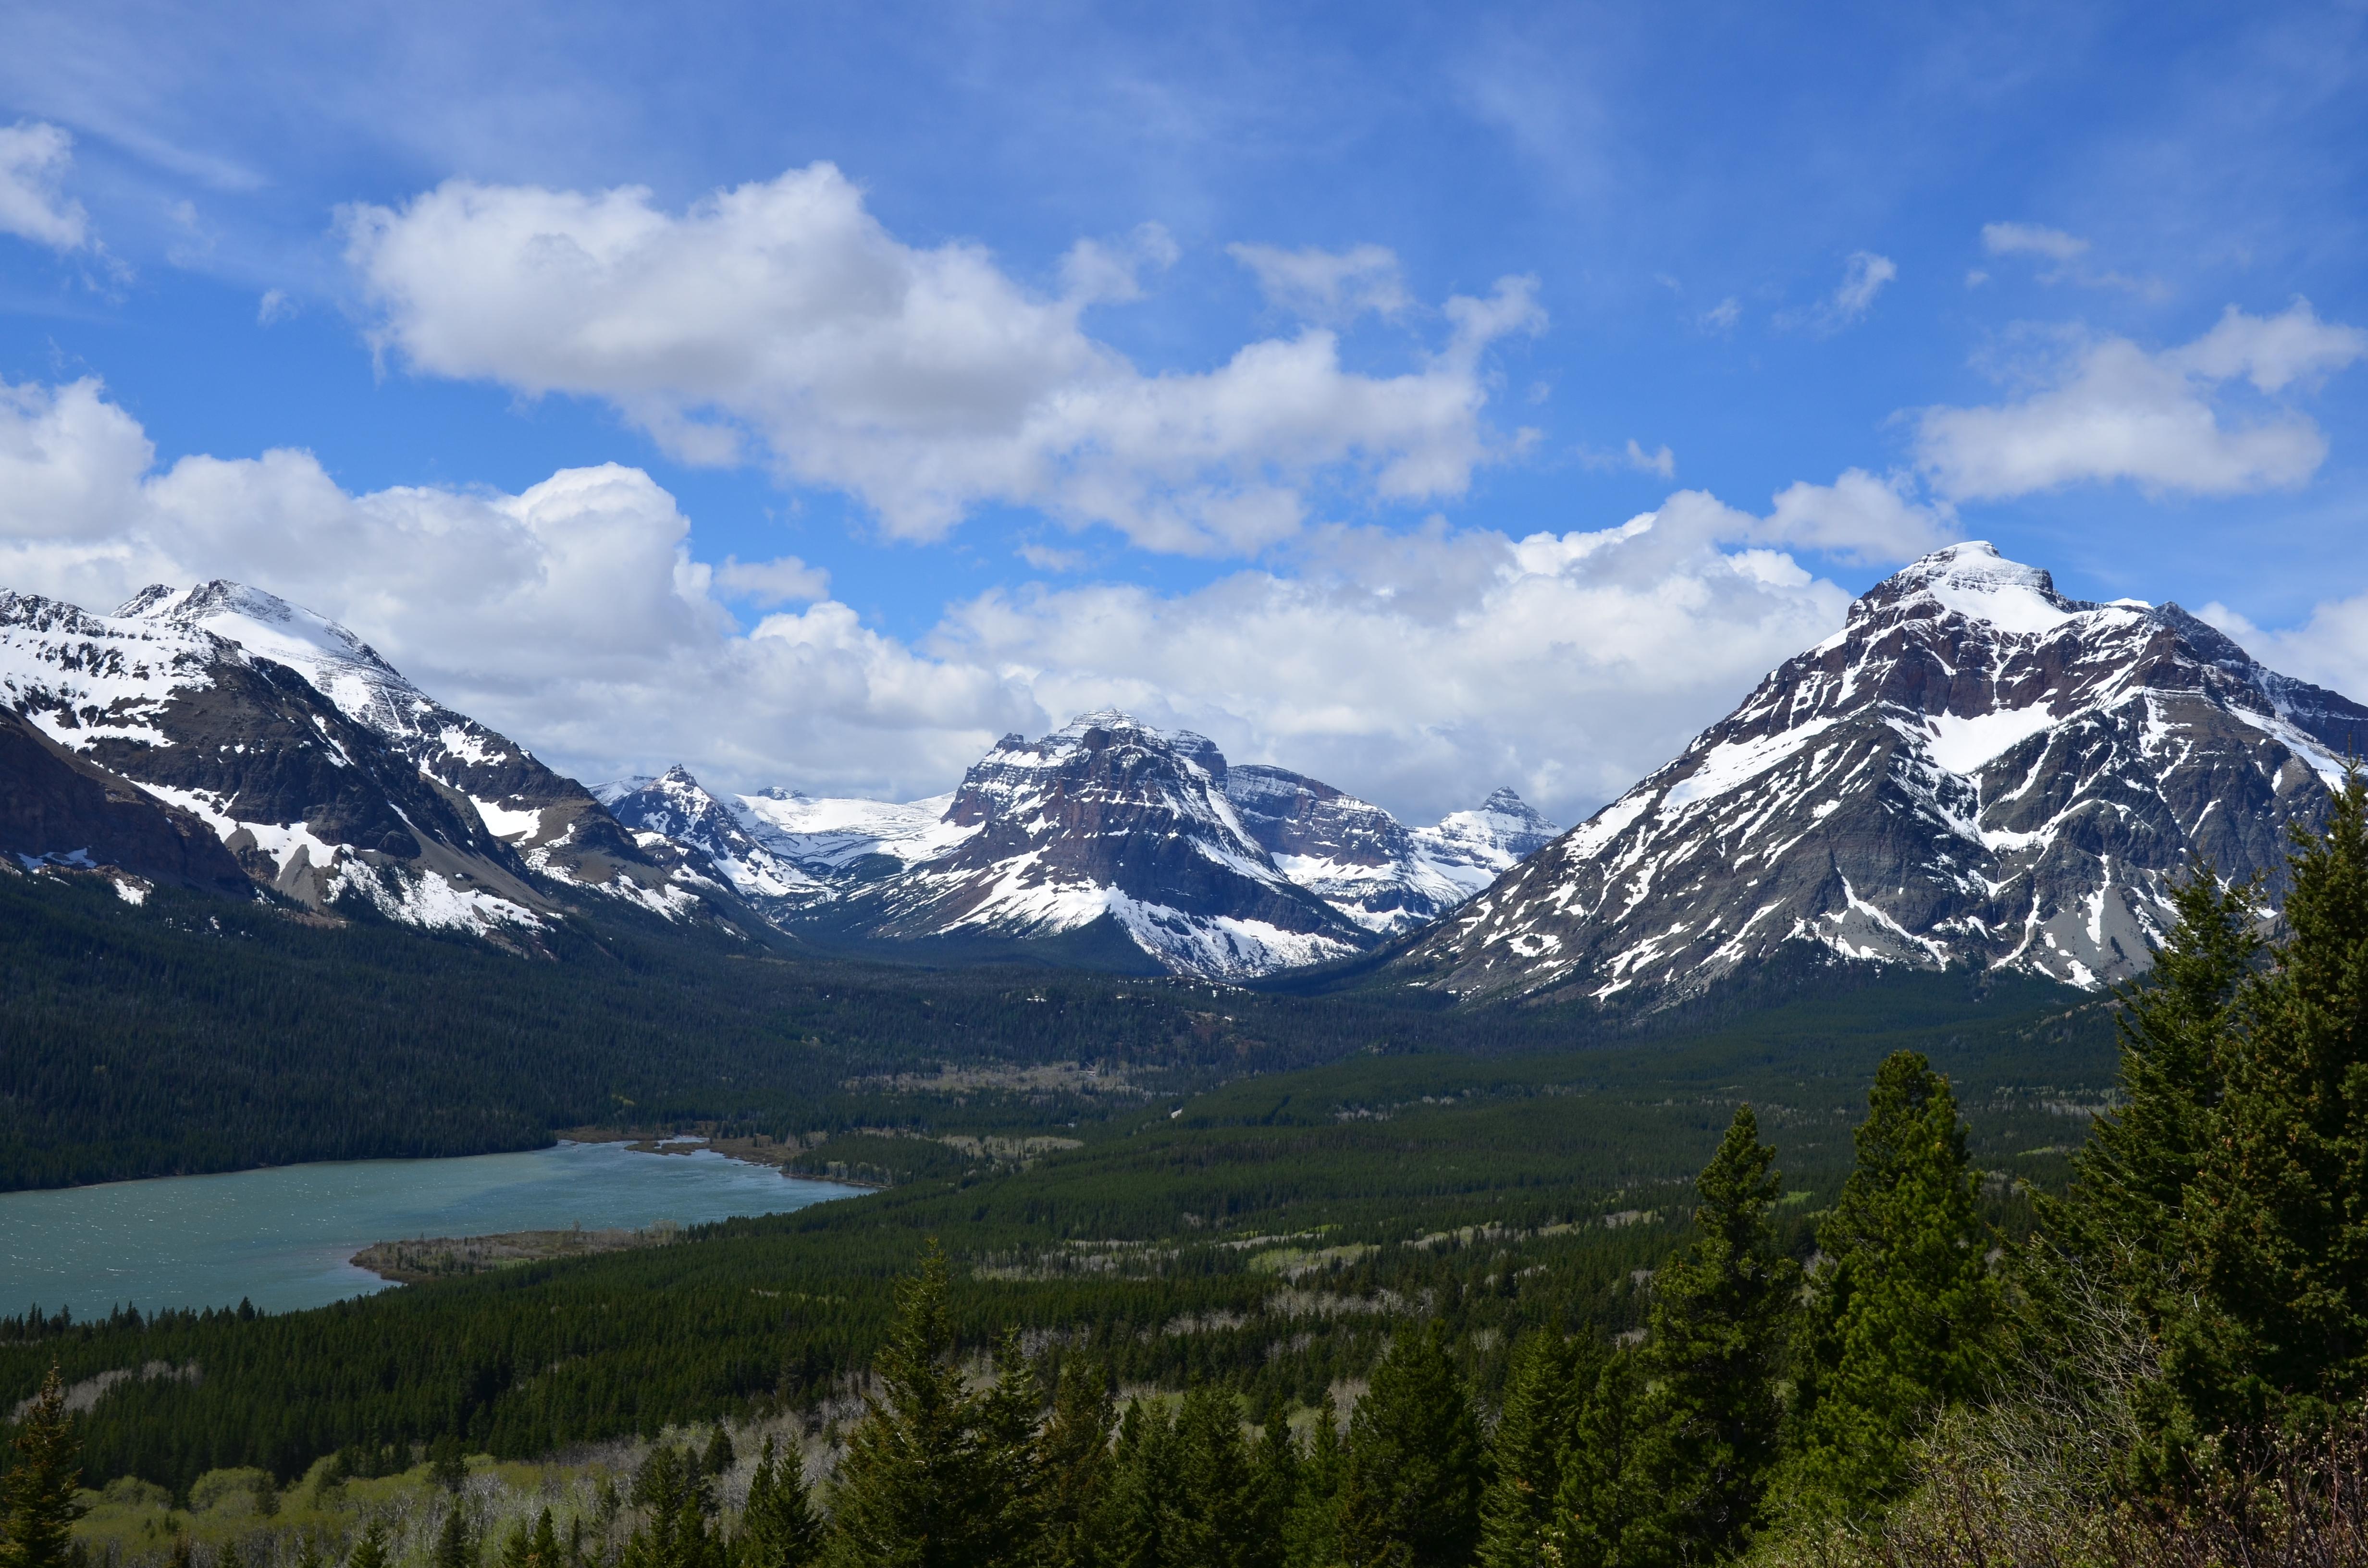 Fondo De Pantalla Paisaje Montañas Nevada: Fondos De Pantalla : Lago, Montañas, Naturaleza, Paisaje